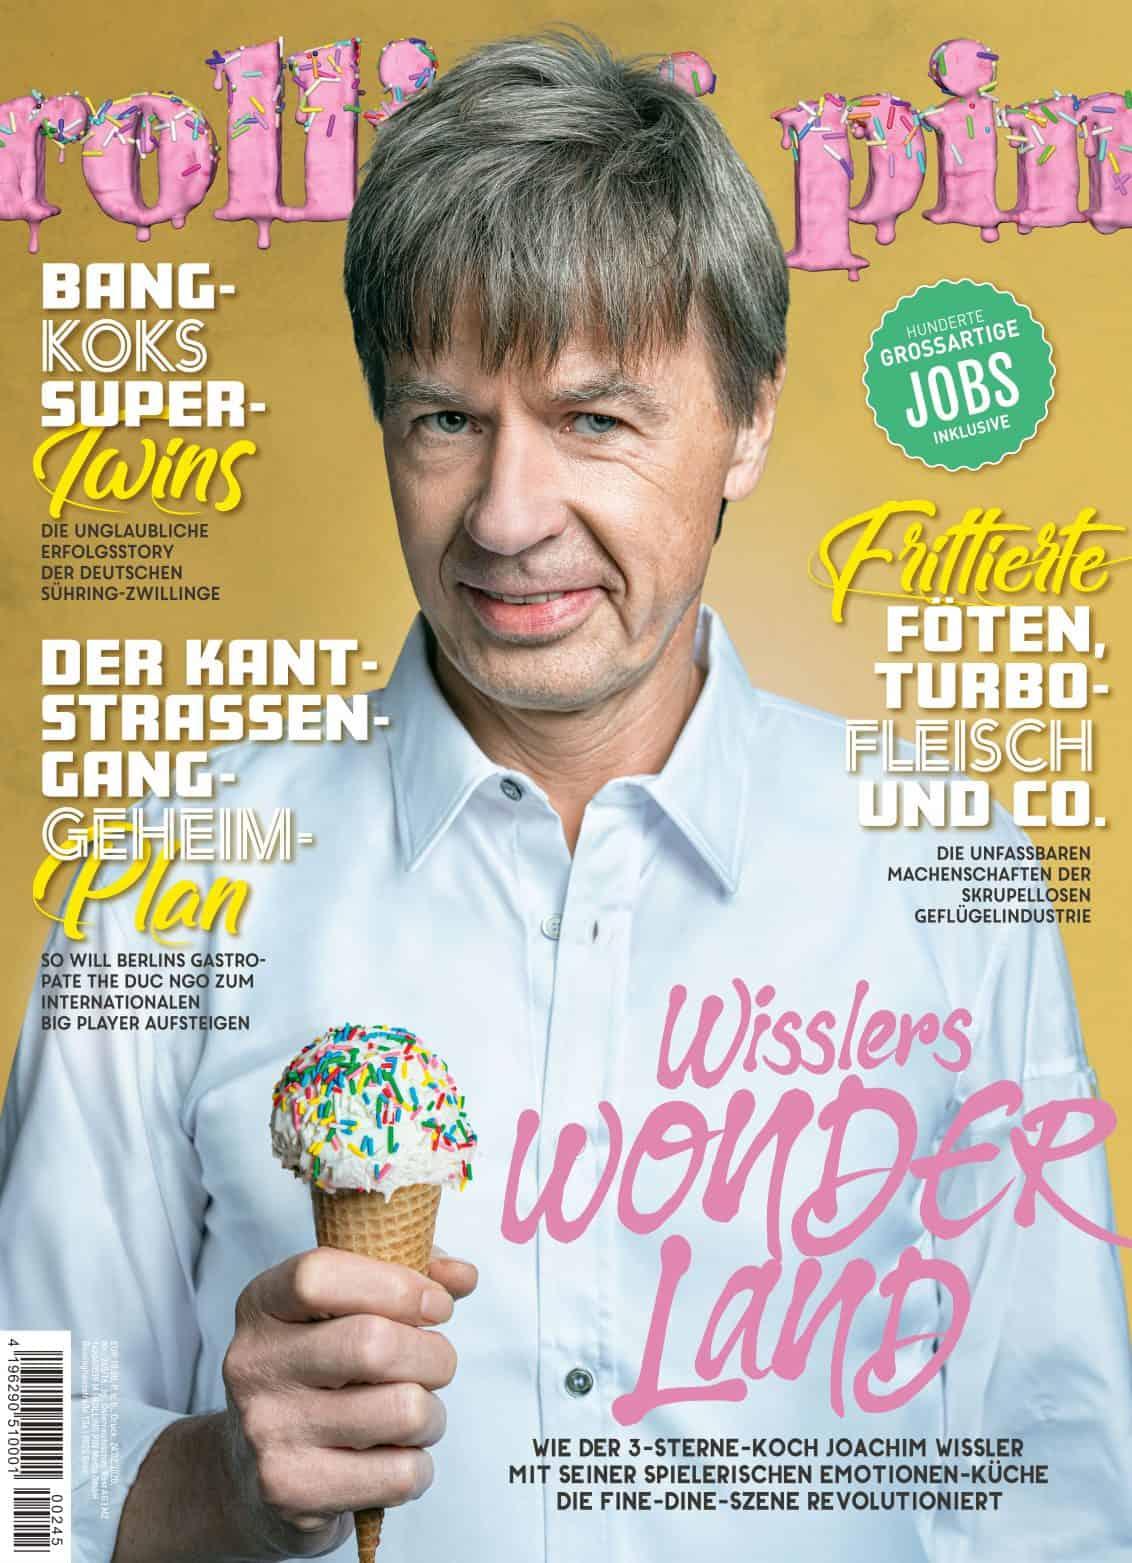 Cover_RP245_Joachim_Wissler-1132x1563